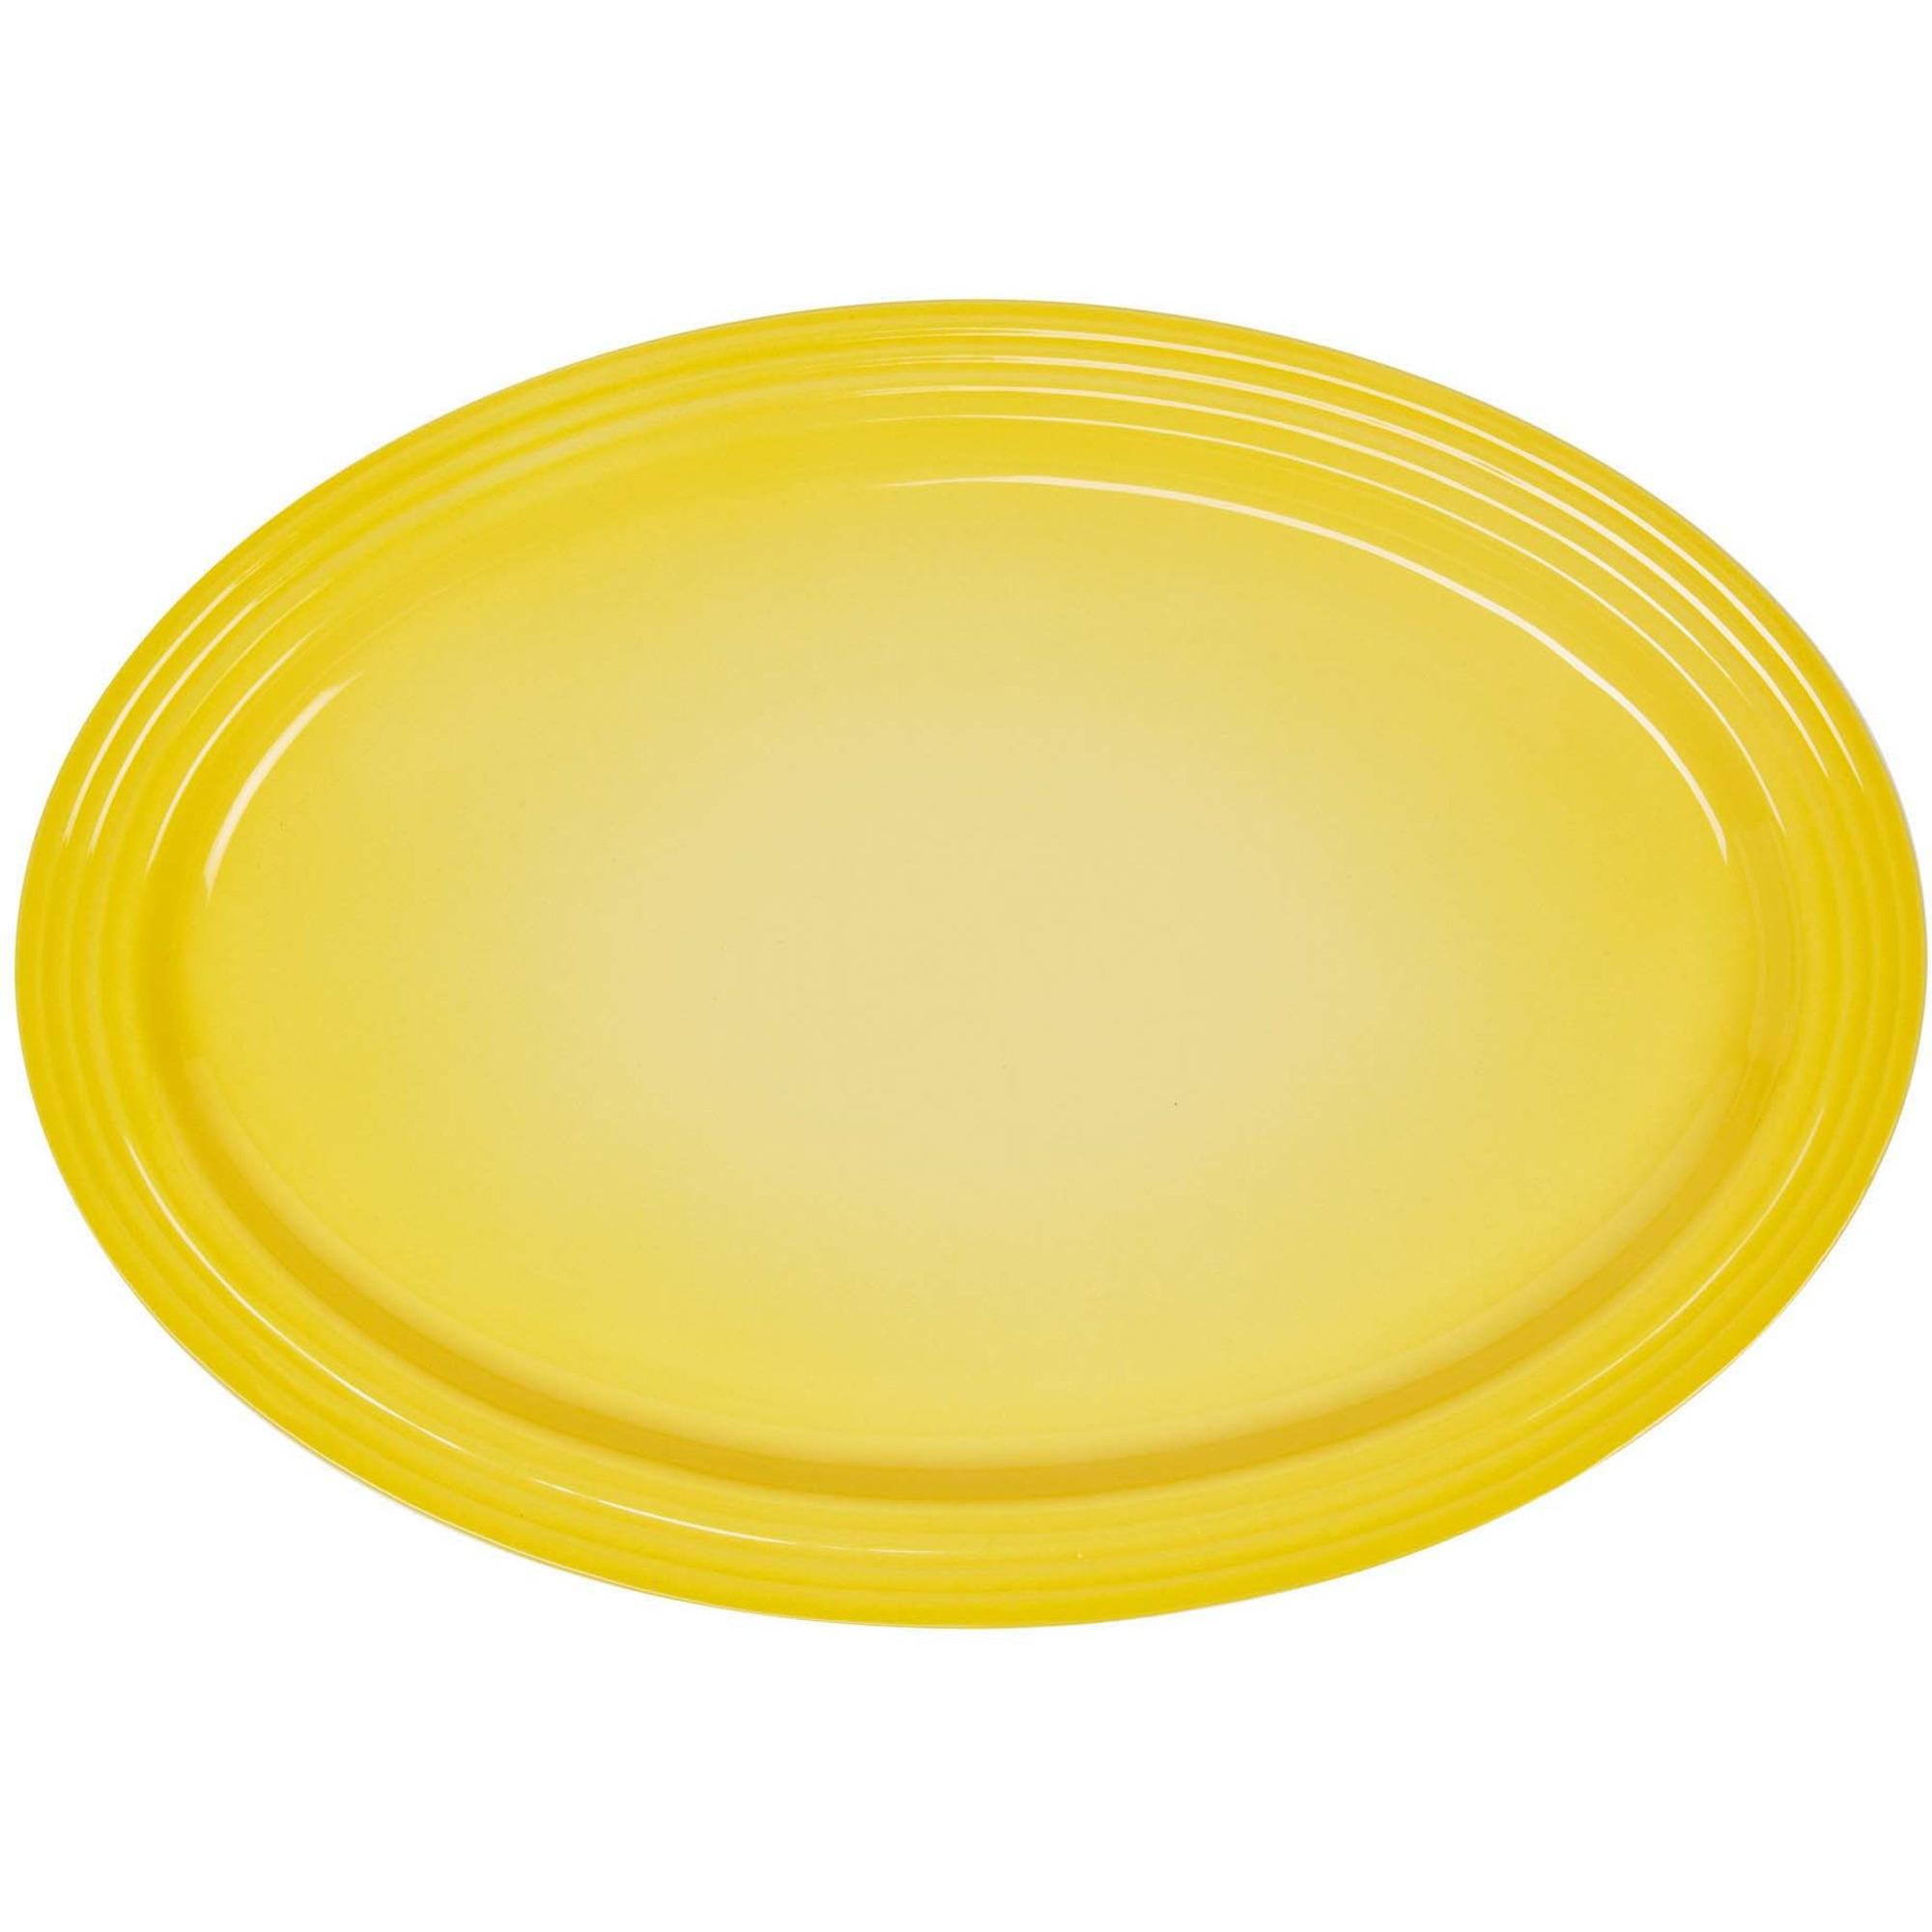 Le Creuset Signature Stort ovalt serveringsfat 46cm Soleil